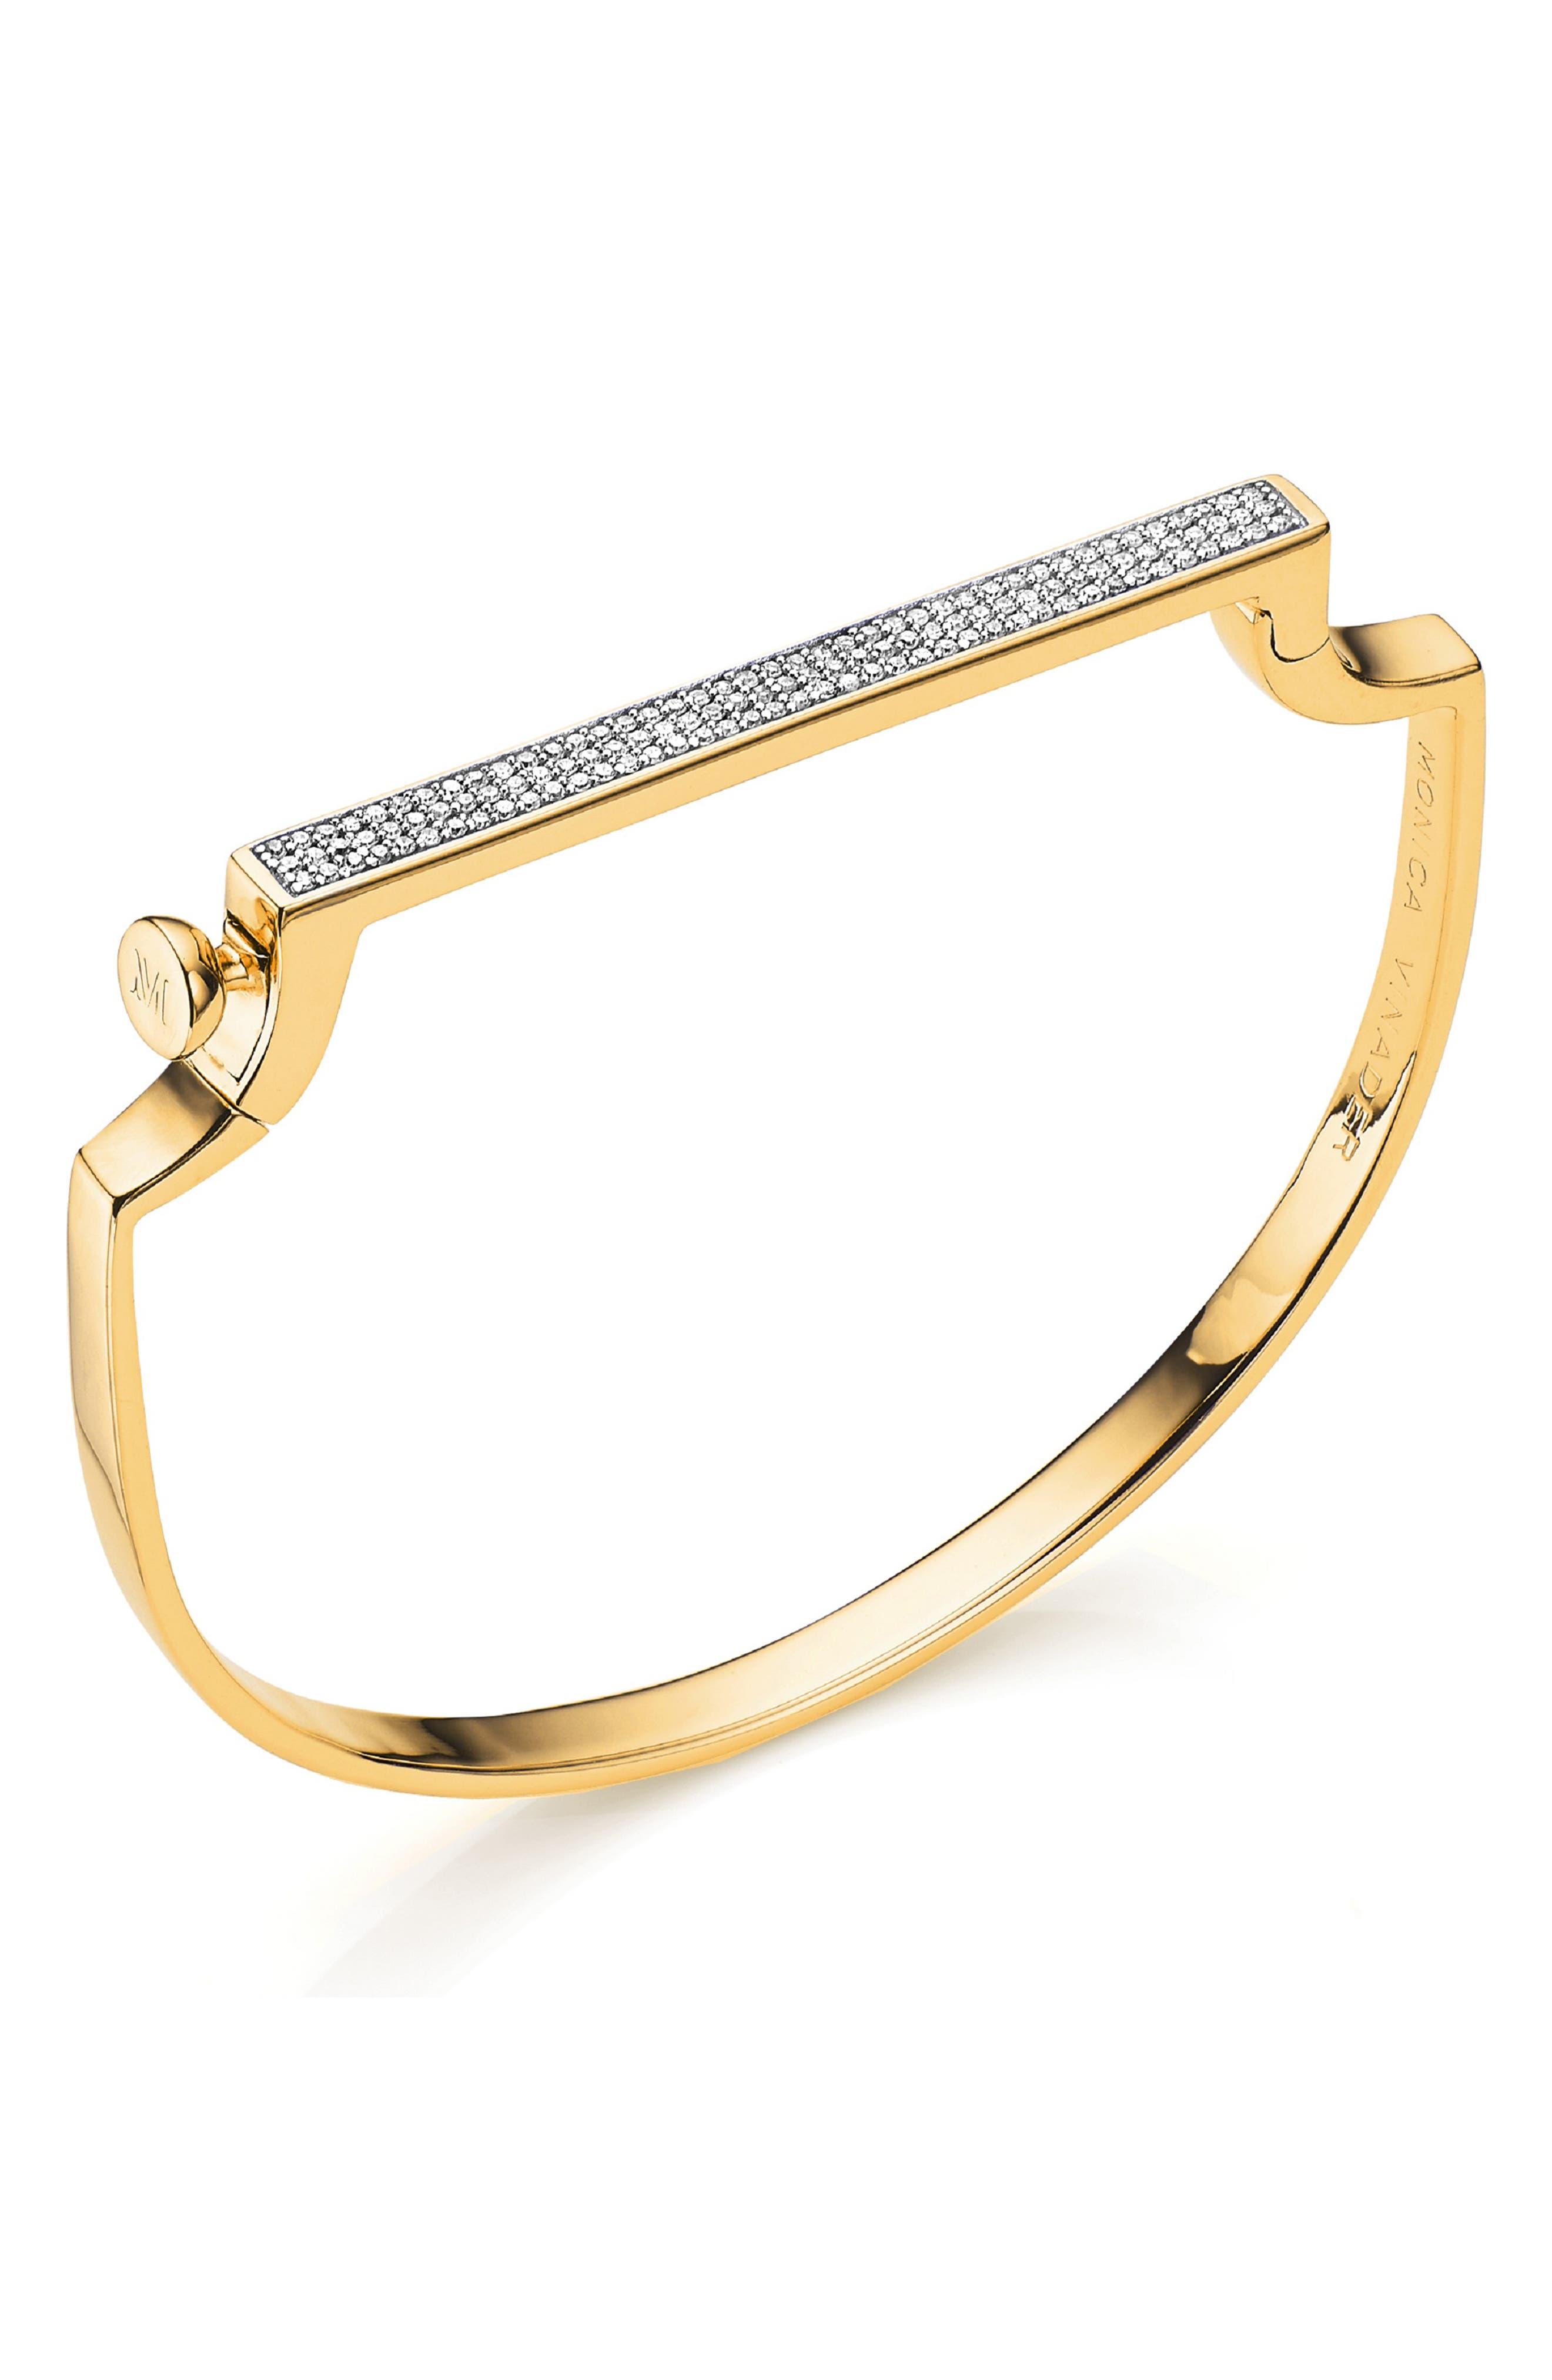 Signature Thin Diamond Bangle,                         Main,                         color, Yellow Gold/ Diamond